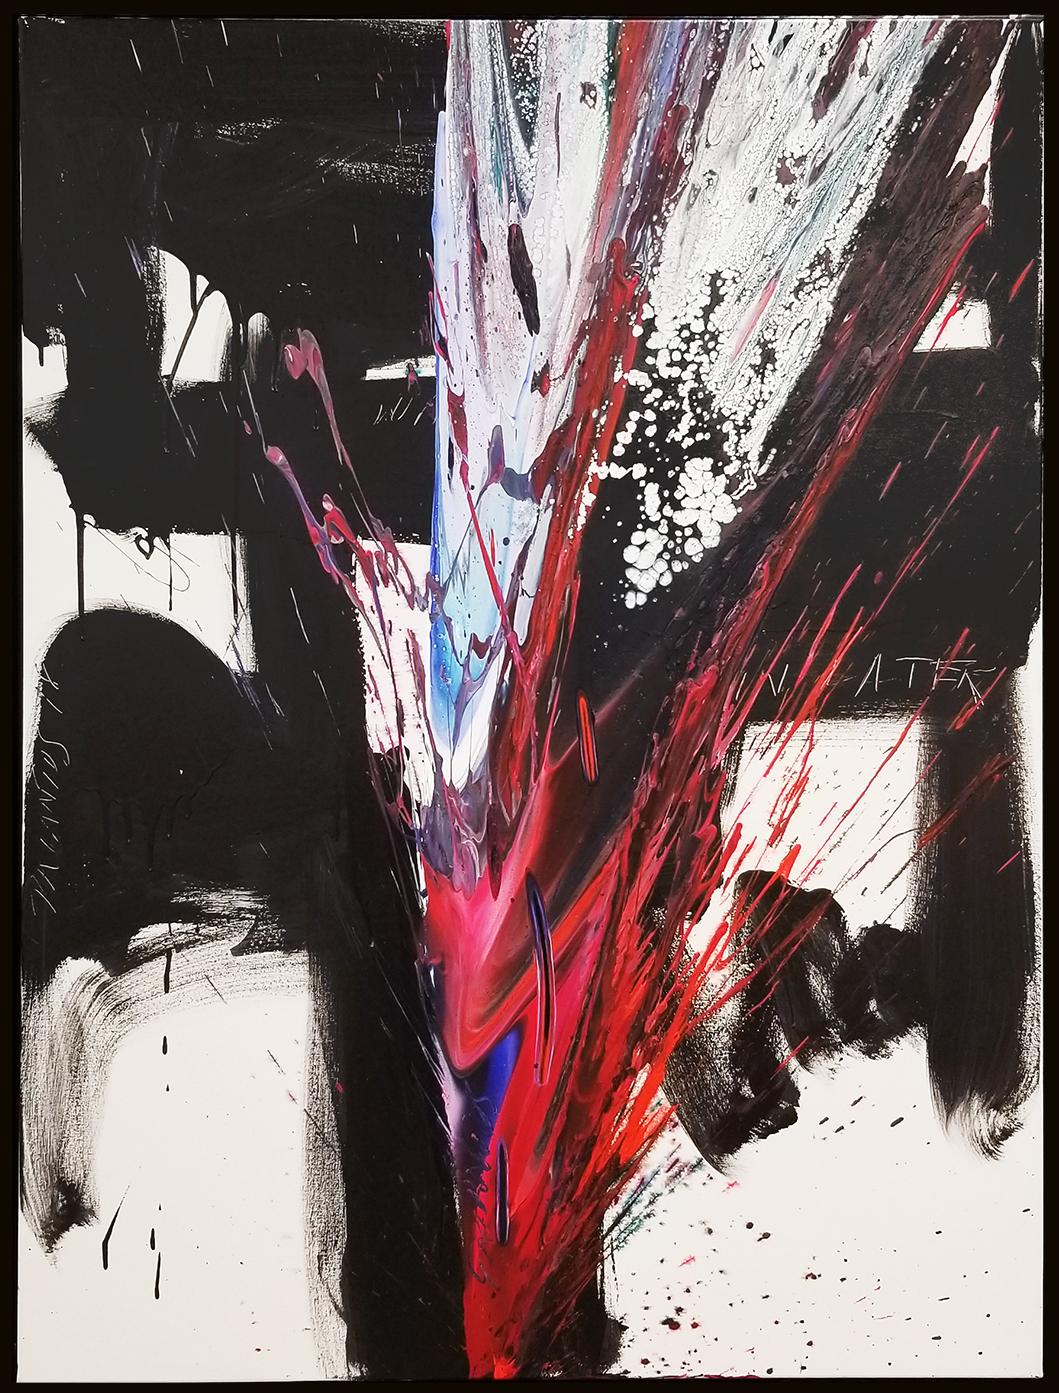 "Splash of Colour 2 #133, 2019, acrylic on canvas, 48"" x 36"" (122 x 91.4)"